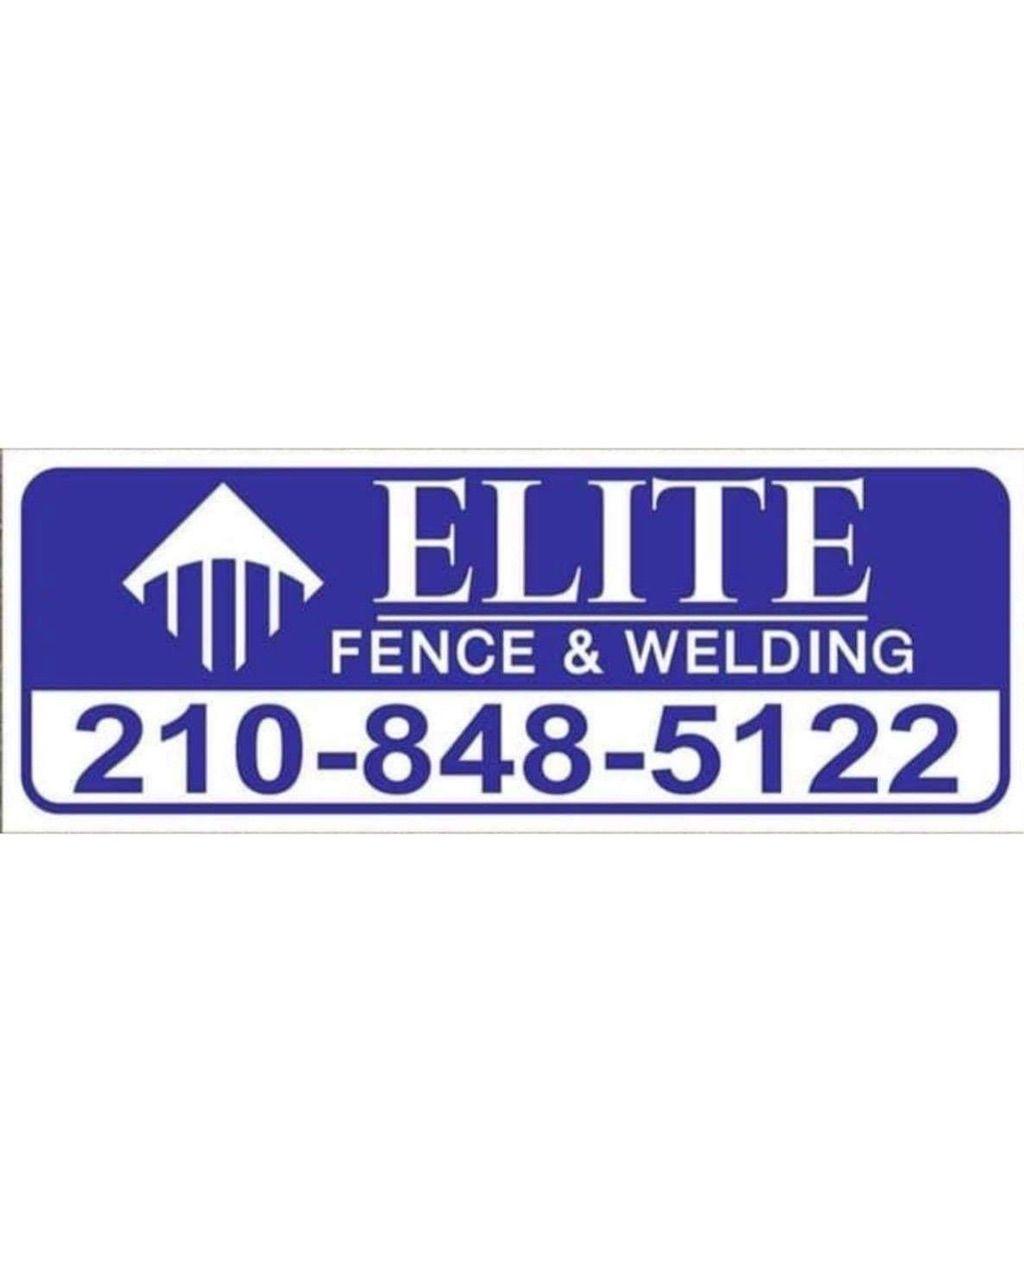 ELITE Fence & Welding